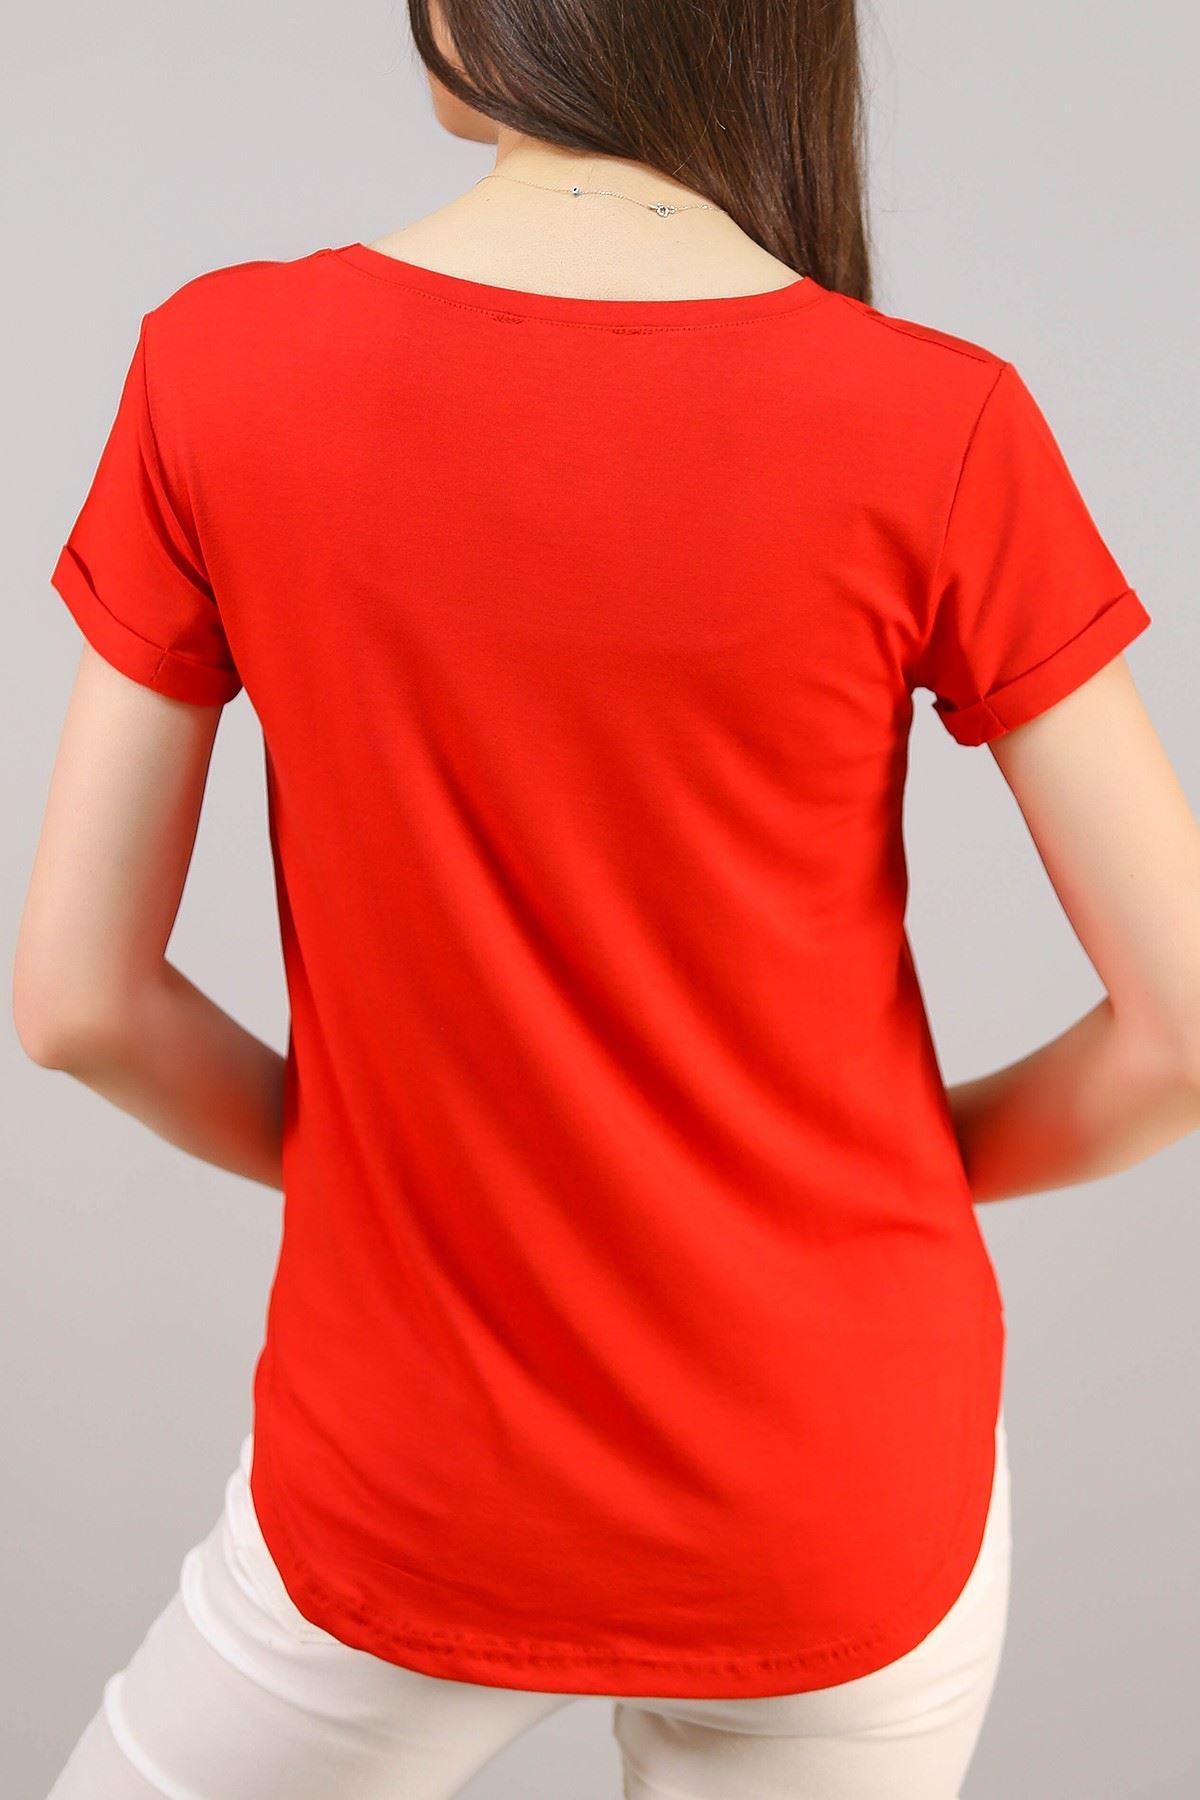 Kadın Cepli Bluz Kırmızı - 1470.1095.